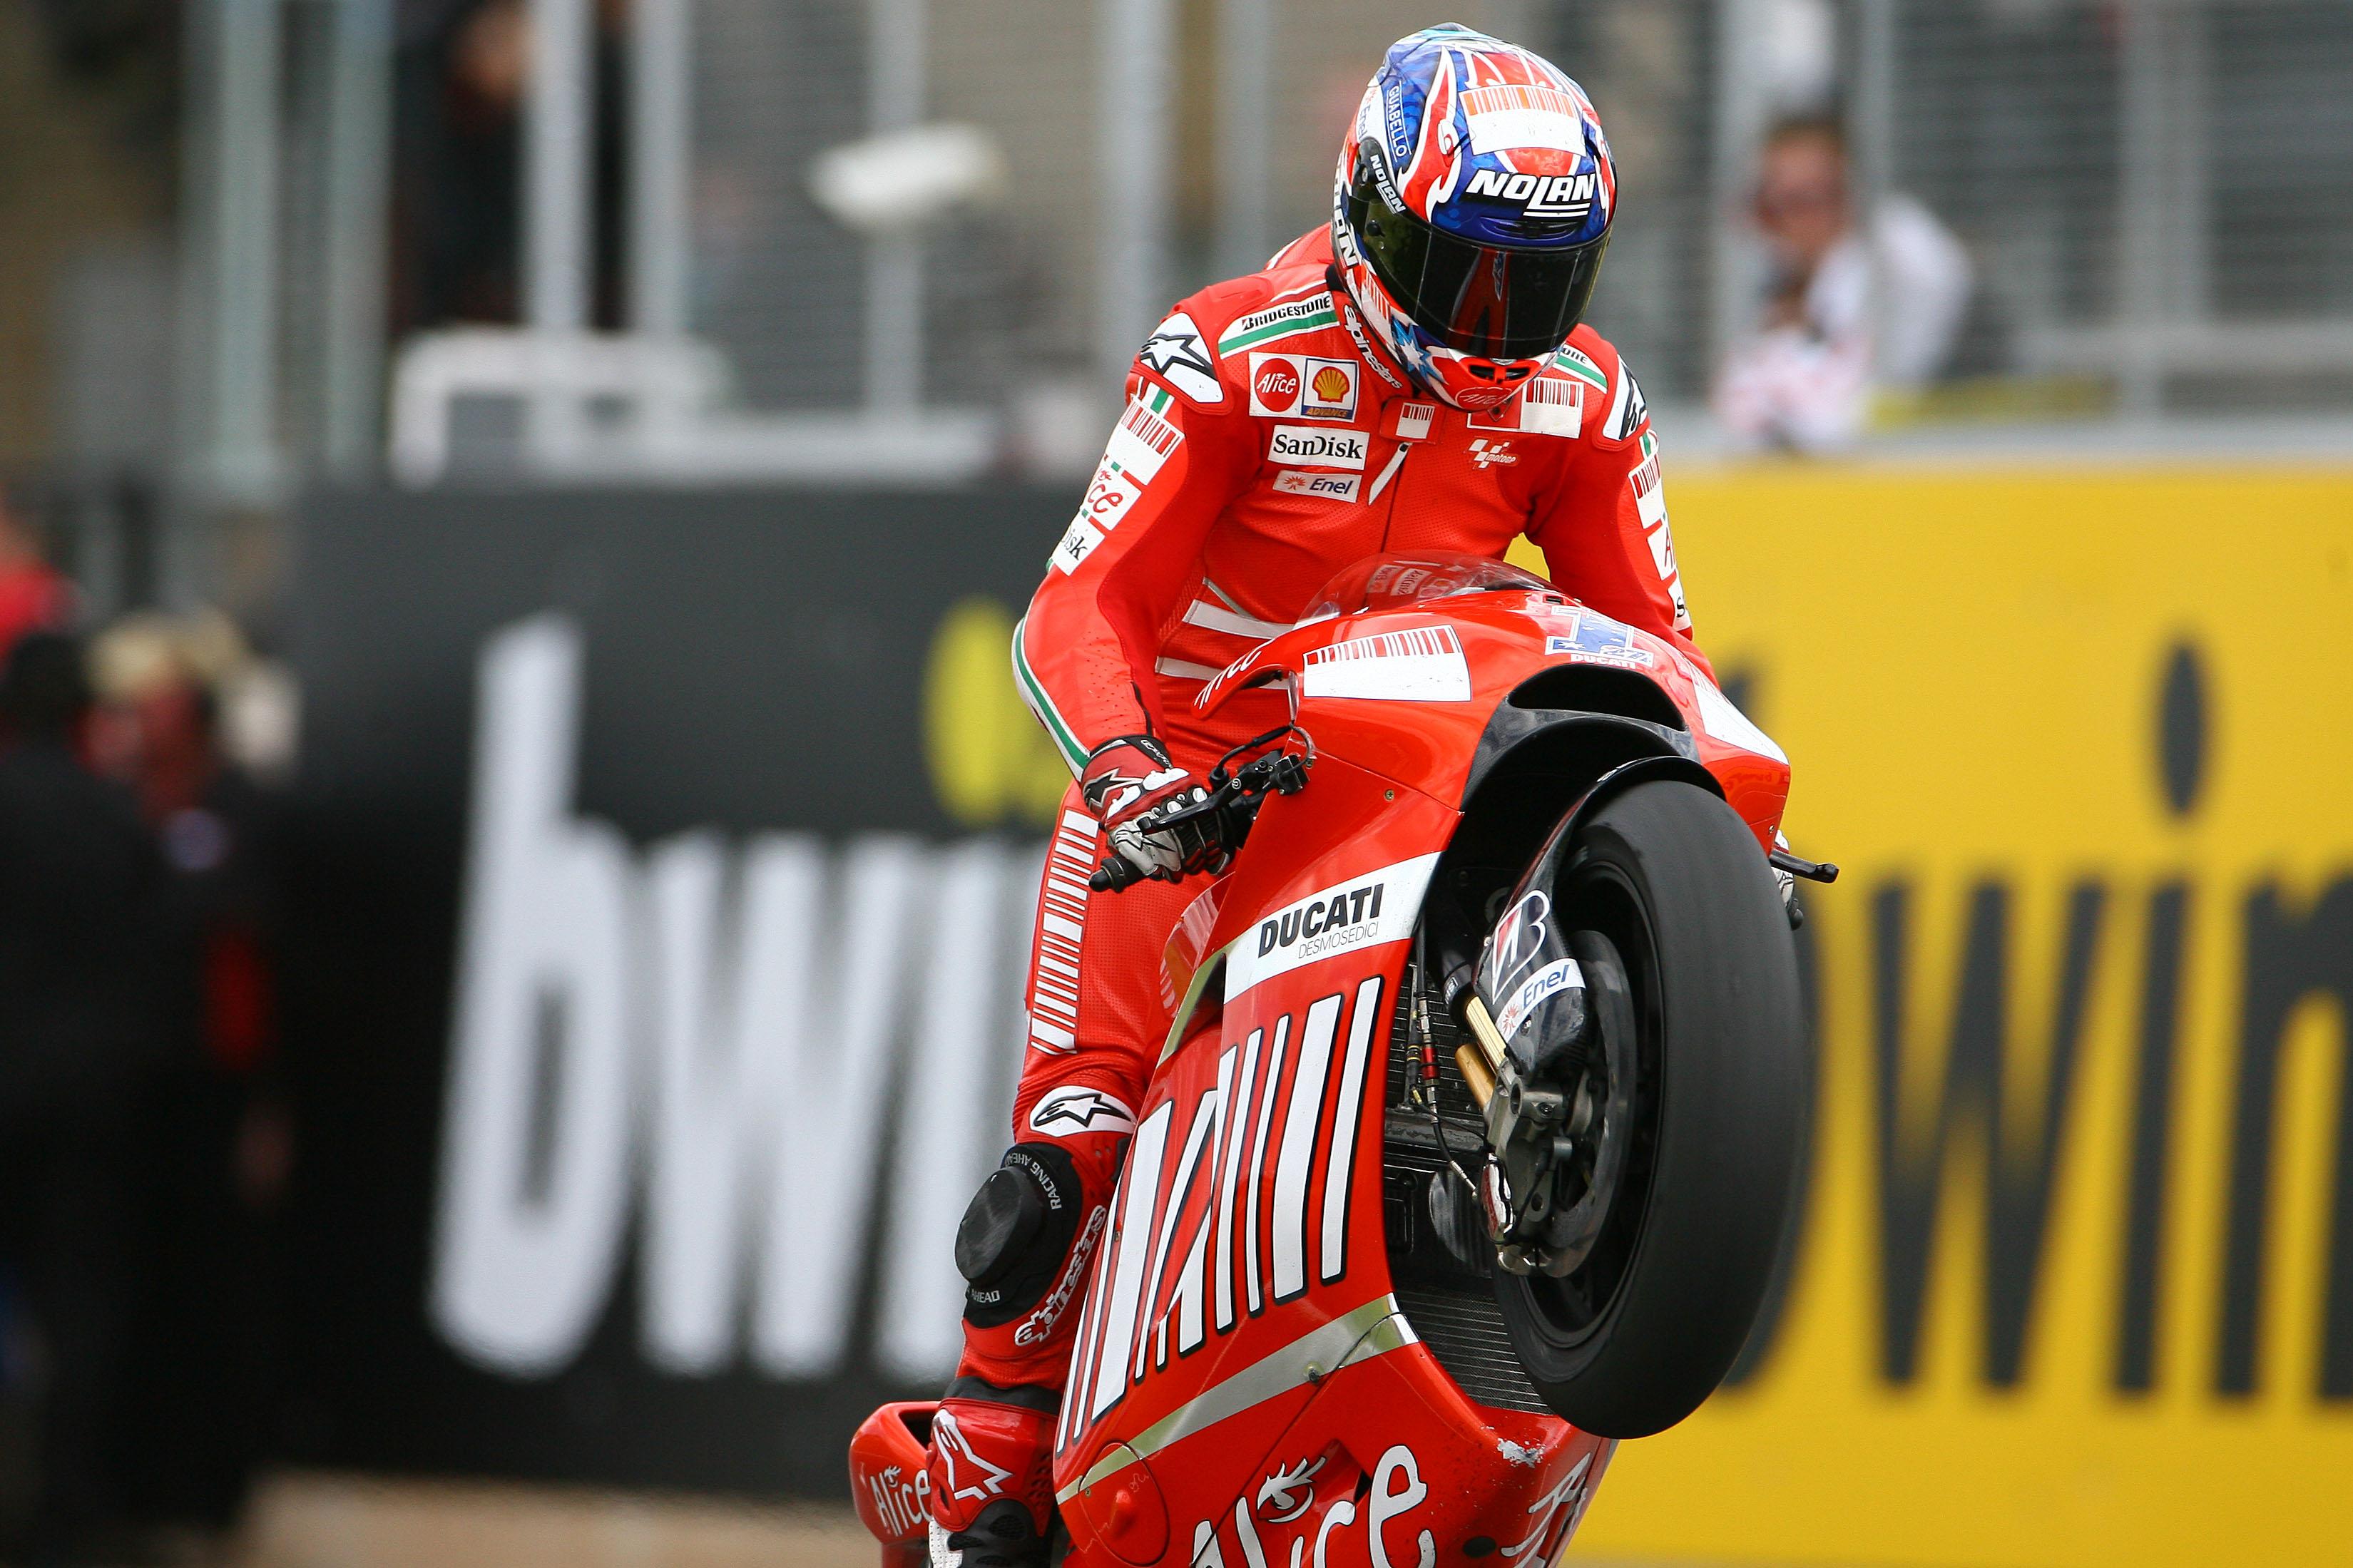 Casey Stoner Ducati wins Donington Park MotoGP 2008